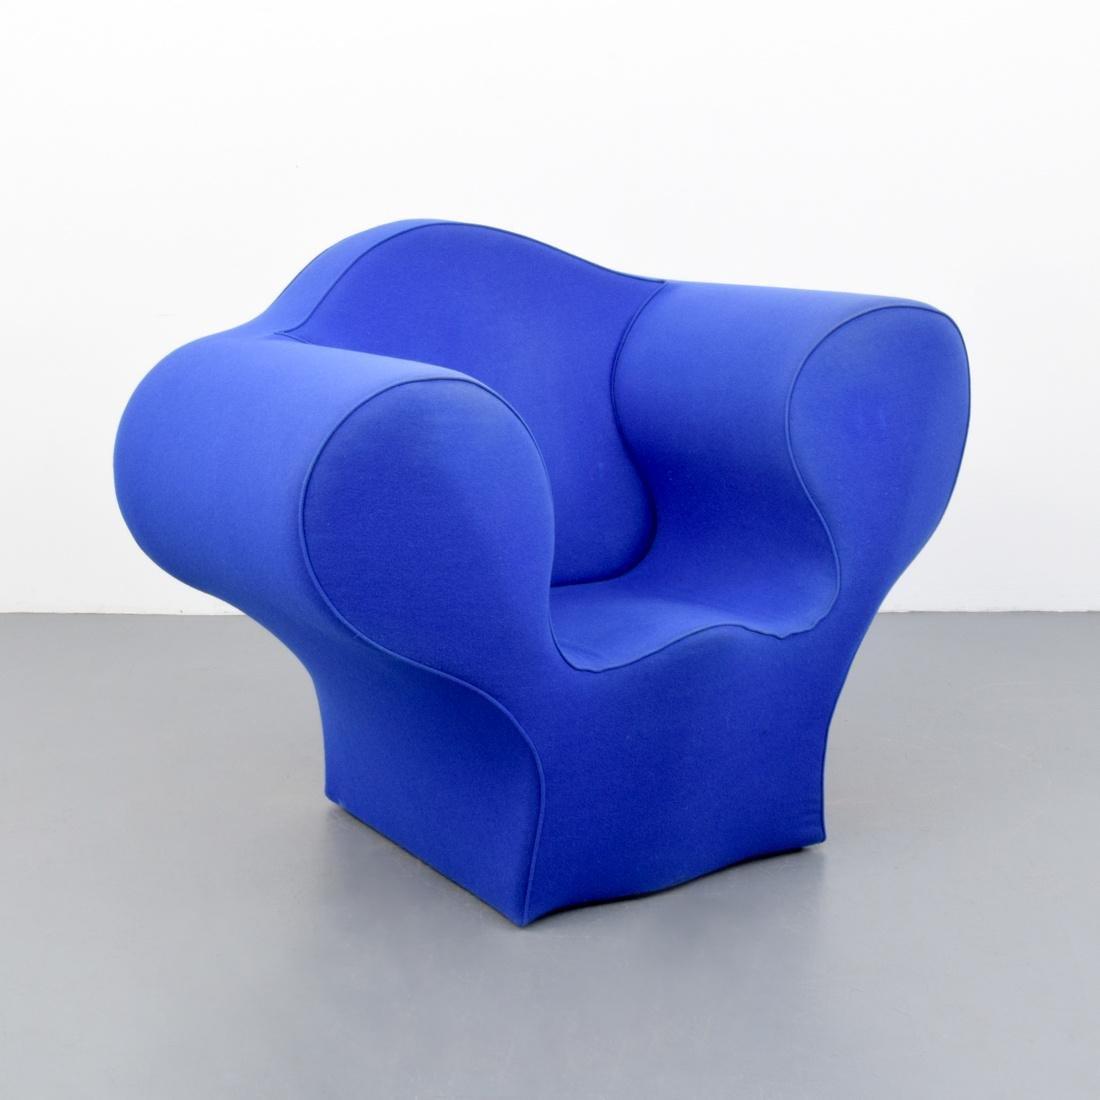 Ron Arad SOFT BIG EASY Lounge Chair